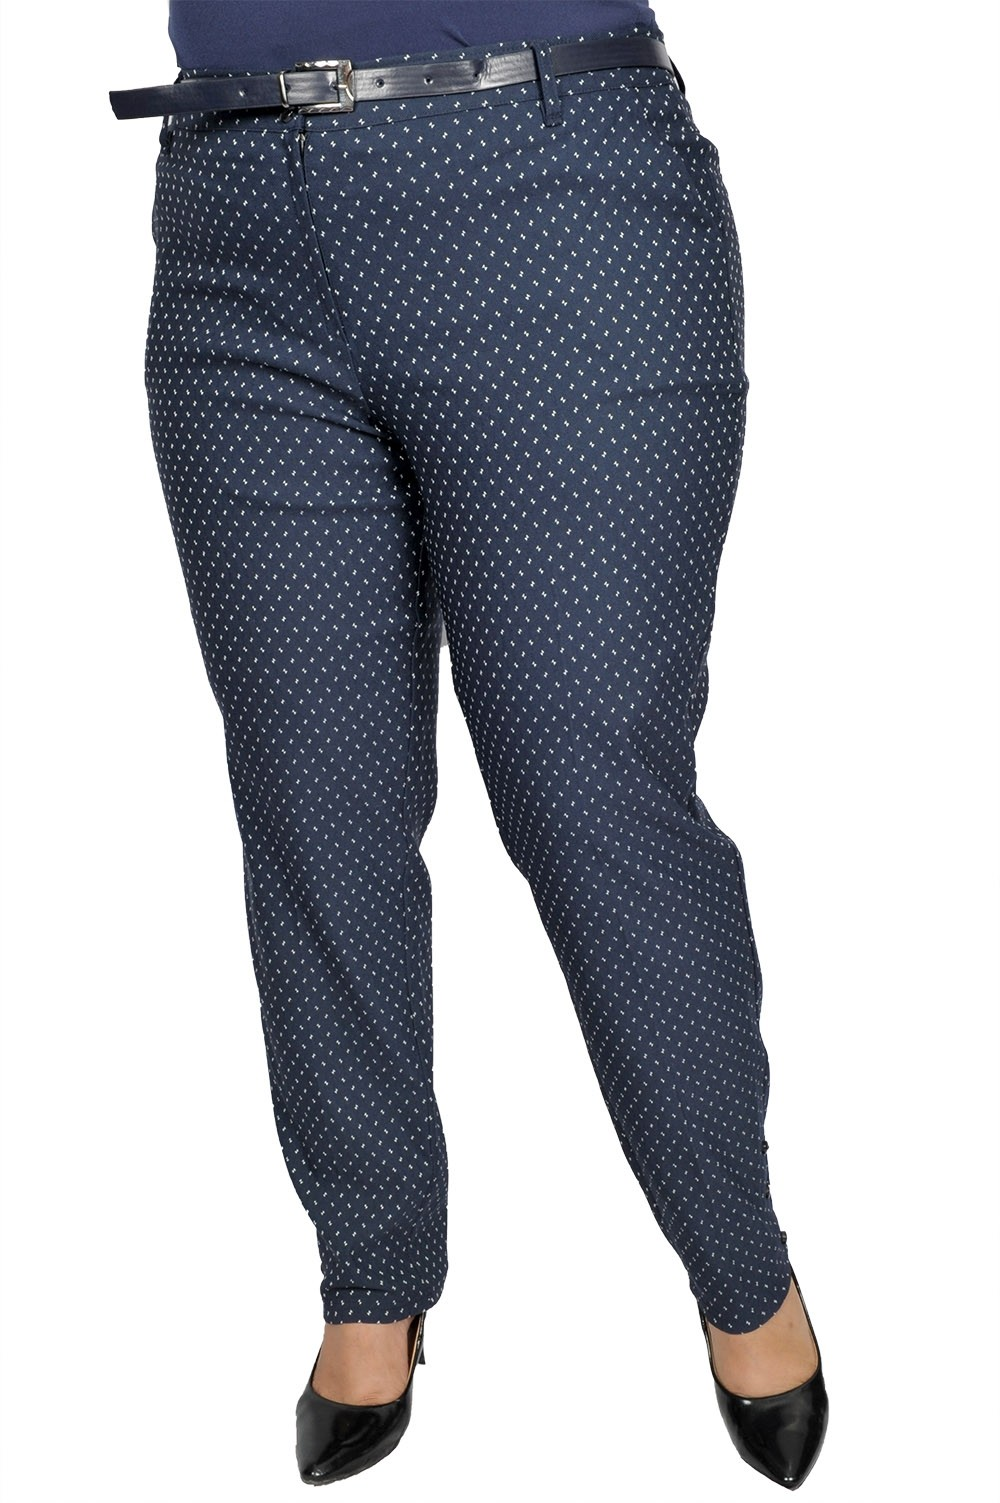 Pantalon elegant cu curea, model KXPACN38